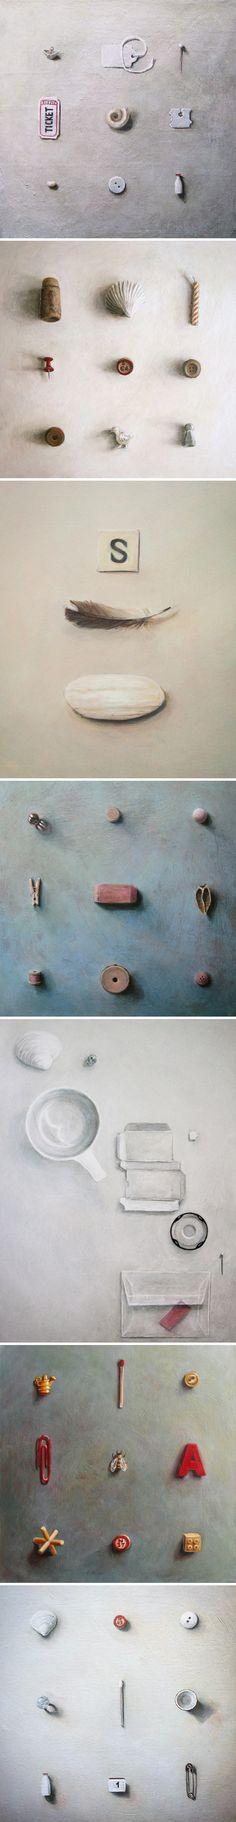 paintings by sarah fagan